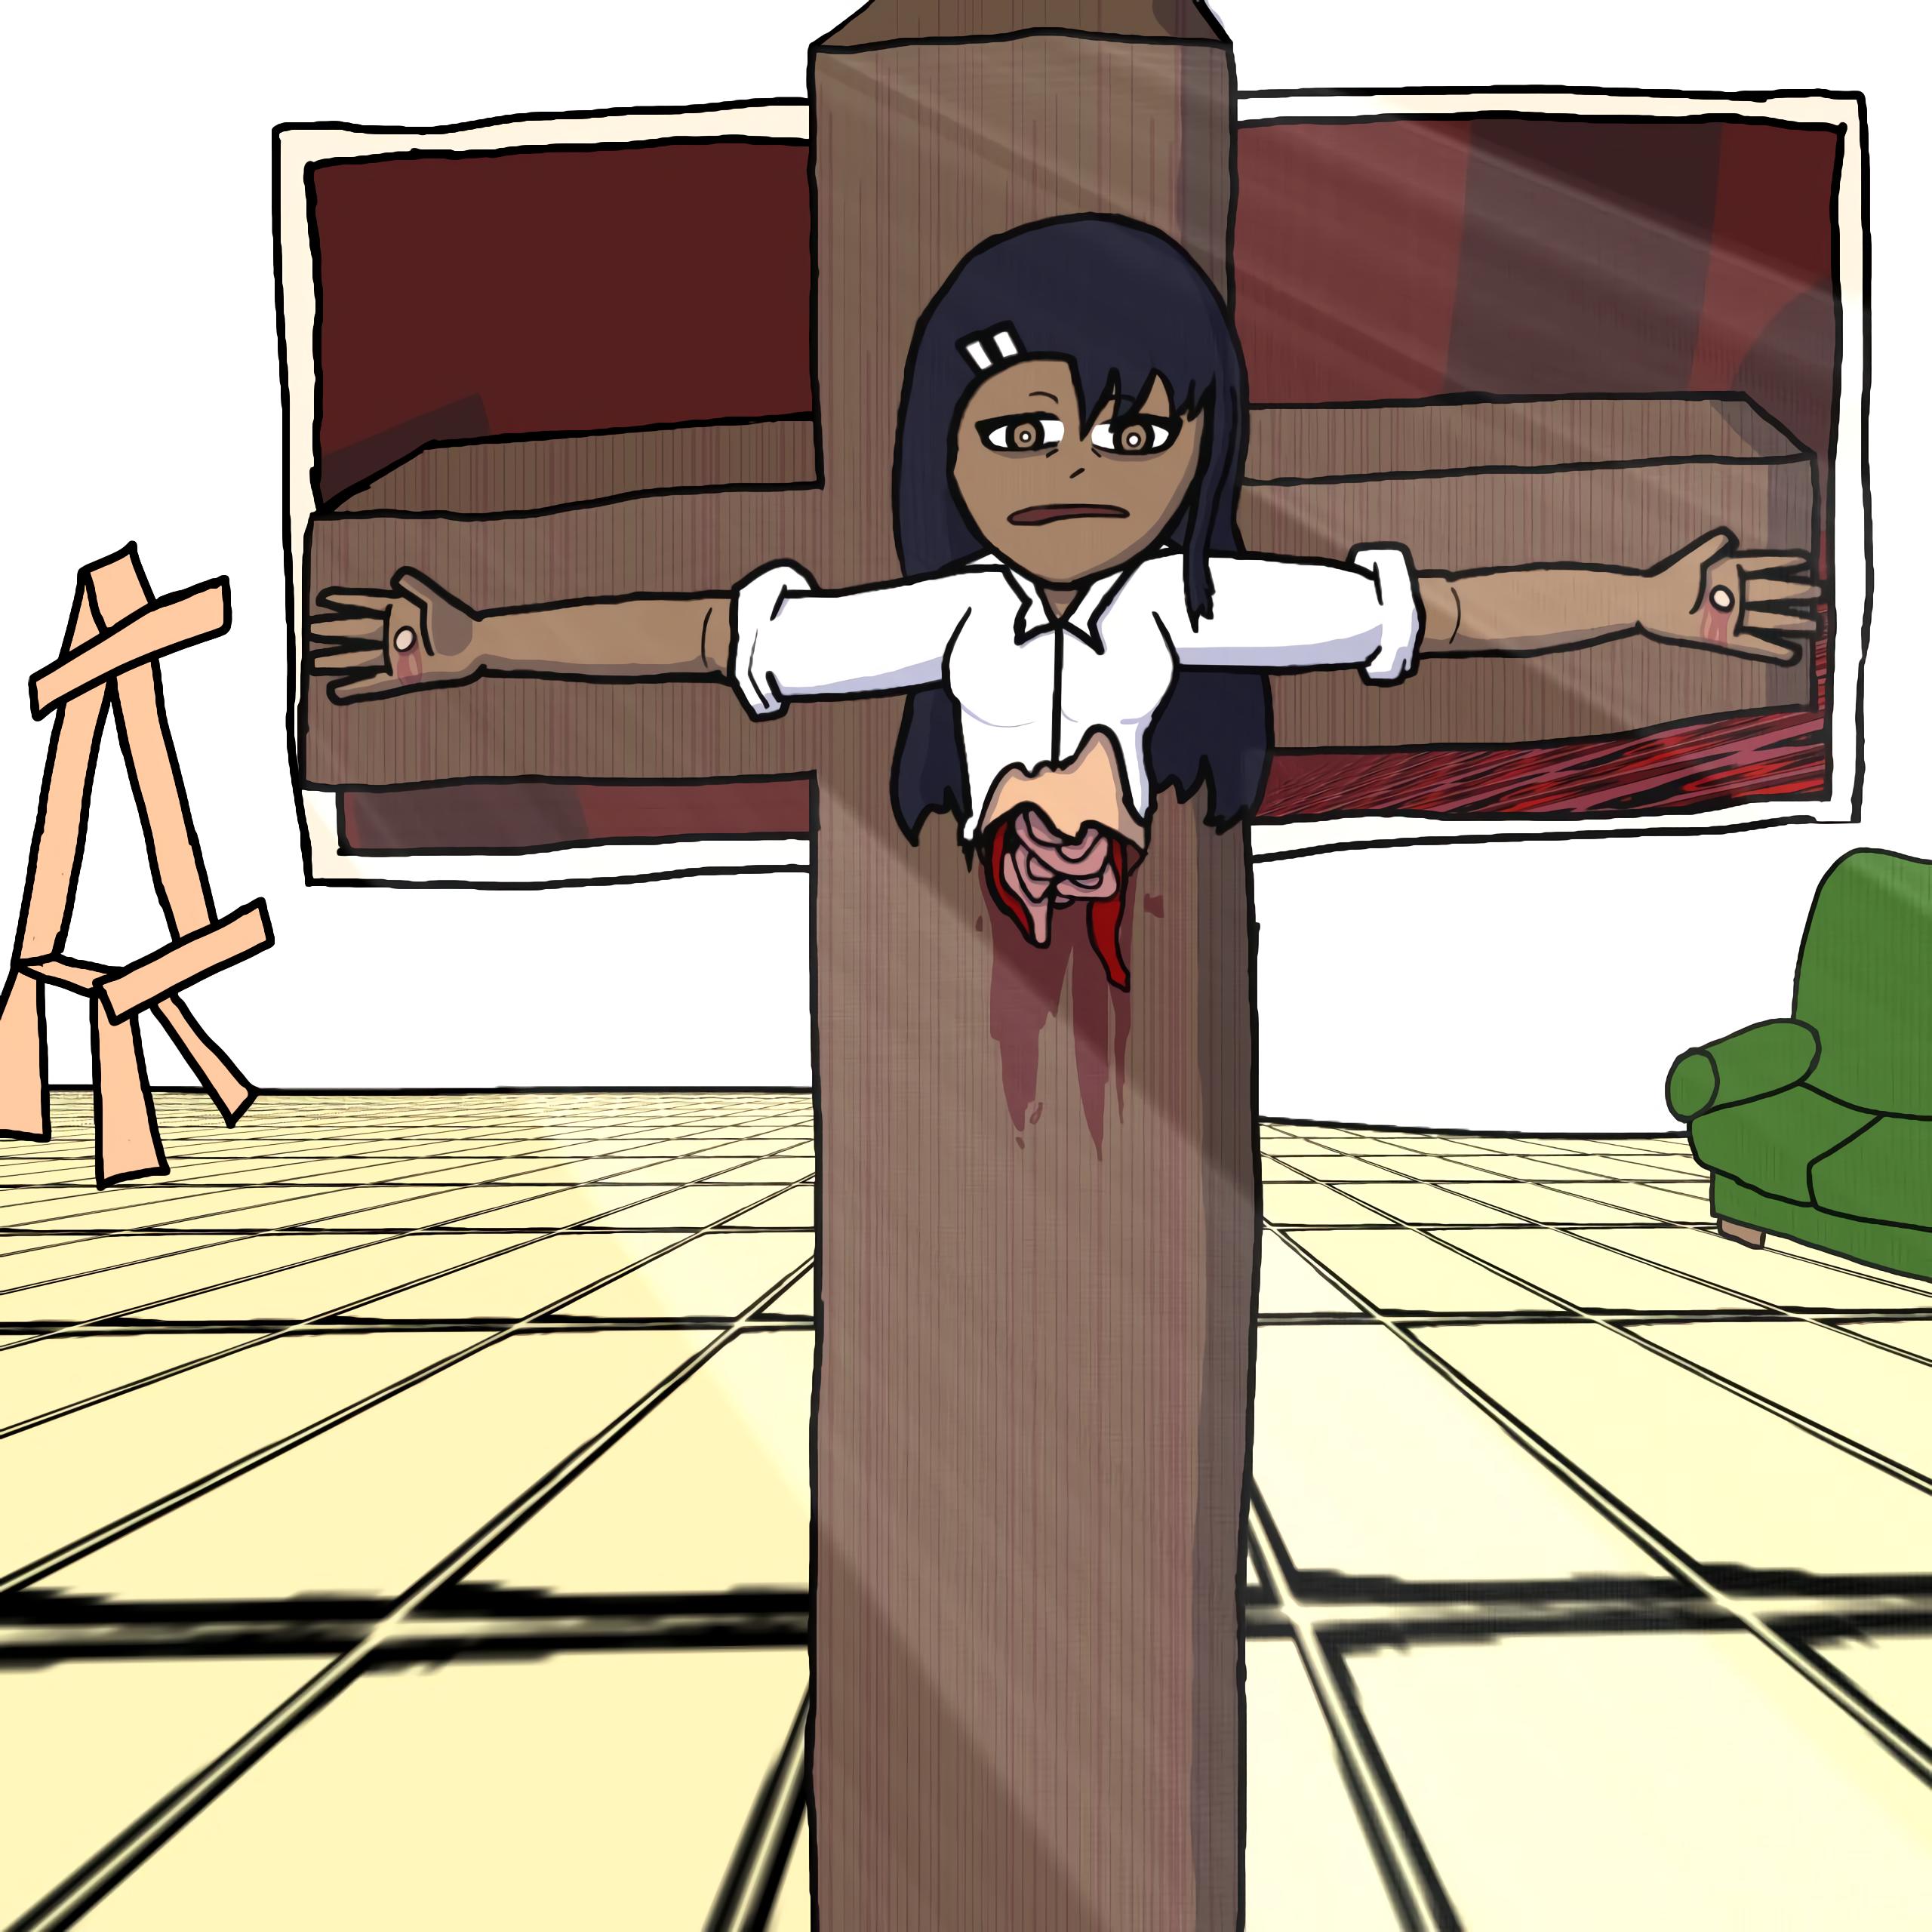 nagatoro on the cross